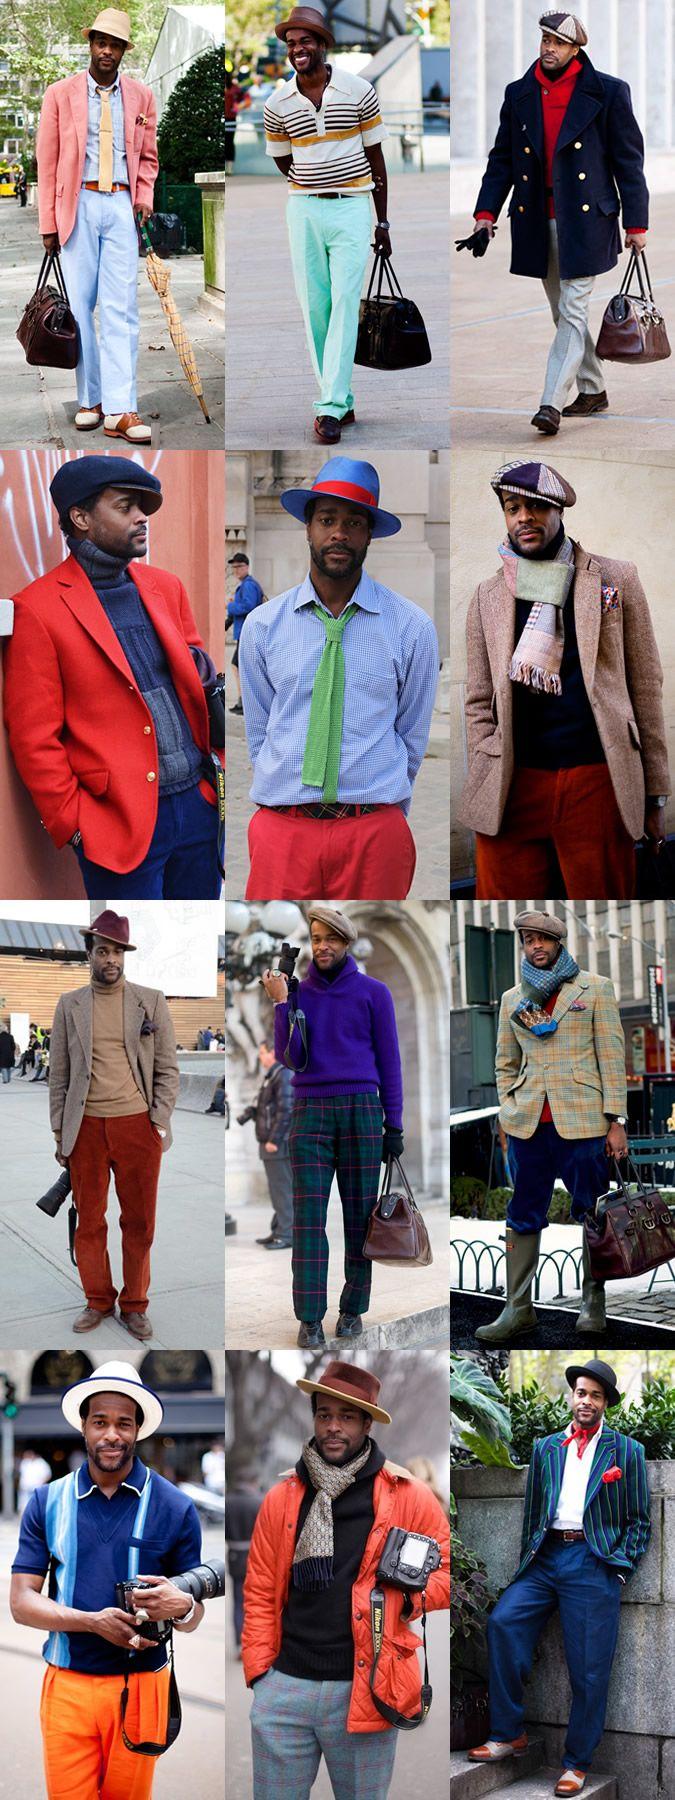 karl-edwin guerre | Men's Style Icon: Karl Edwin Guerre | FashionBeans